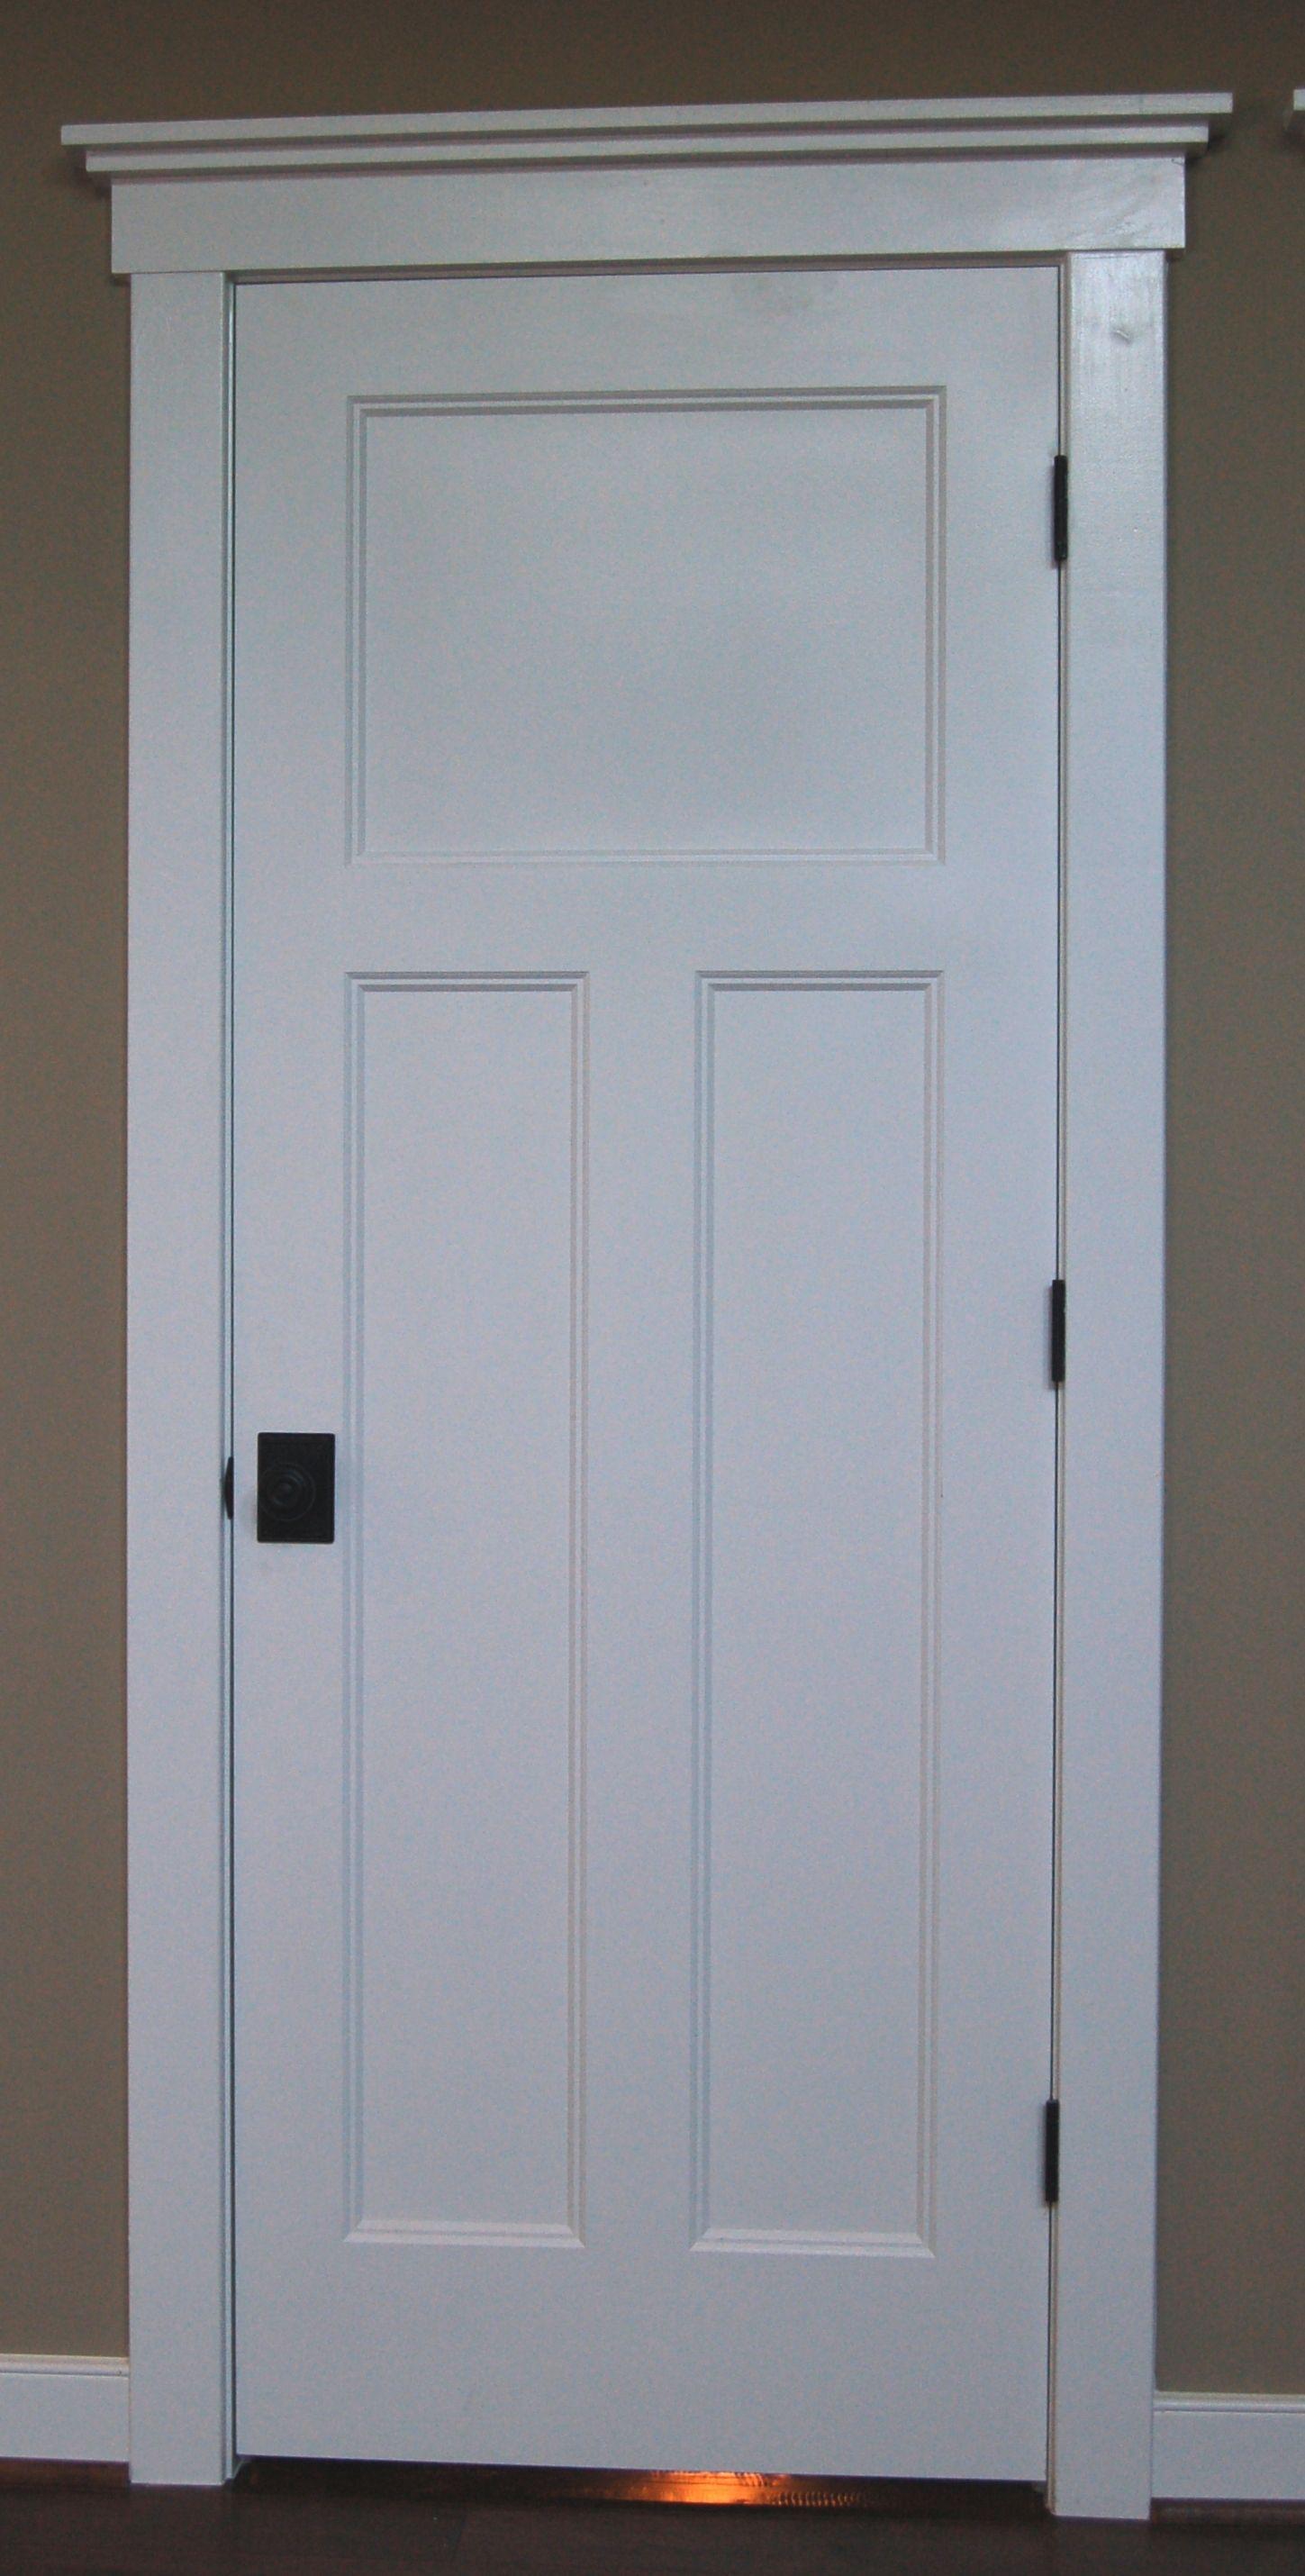 Best Kitchen Gallery: Marvelous Interior Door Trim Styles 1 Craftsman Style Interior of Home Trim Styles on rachelxblog.com